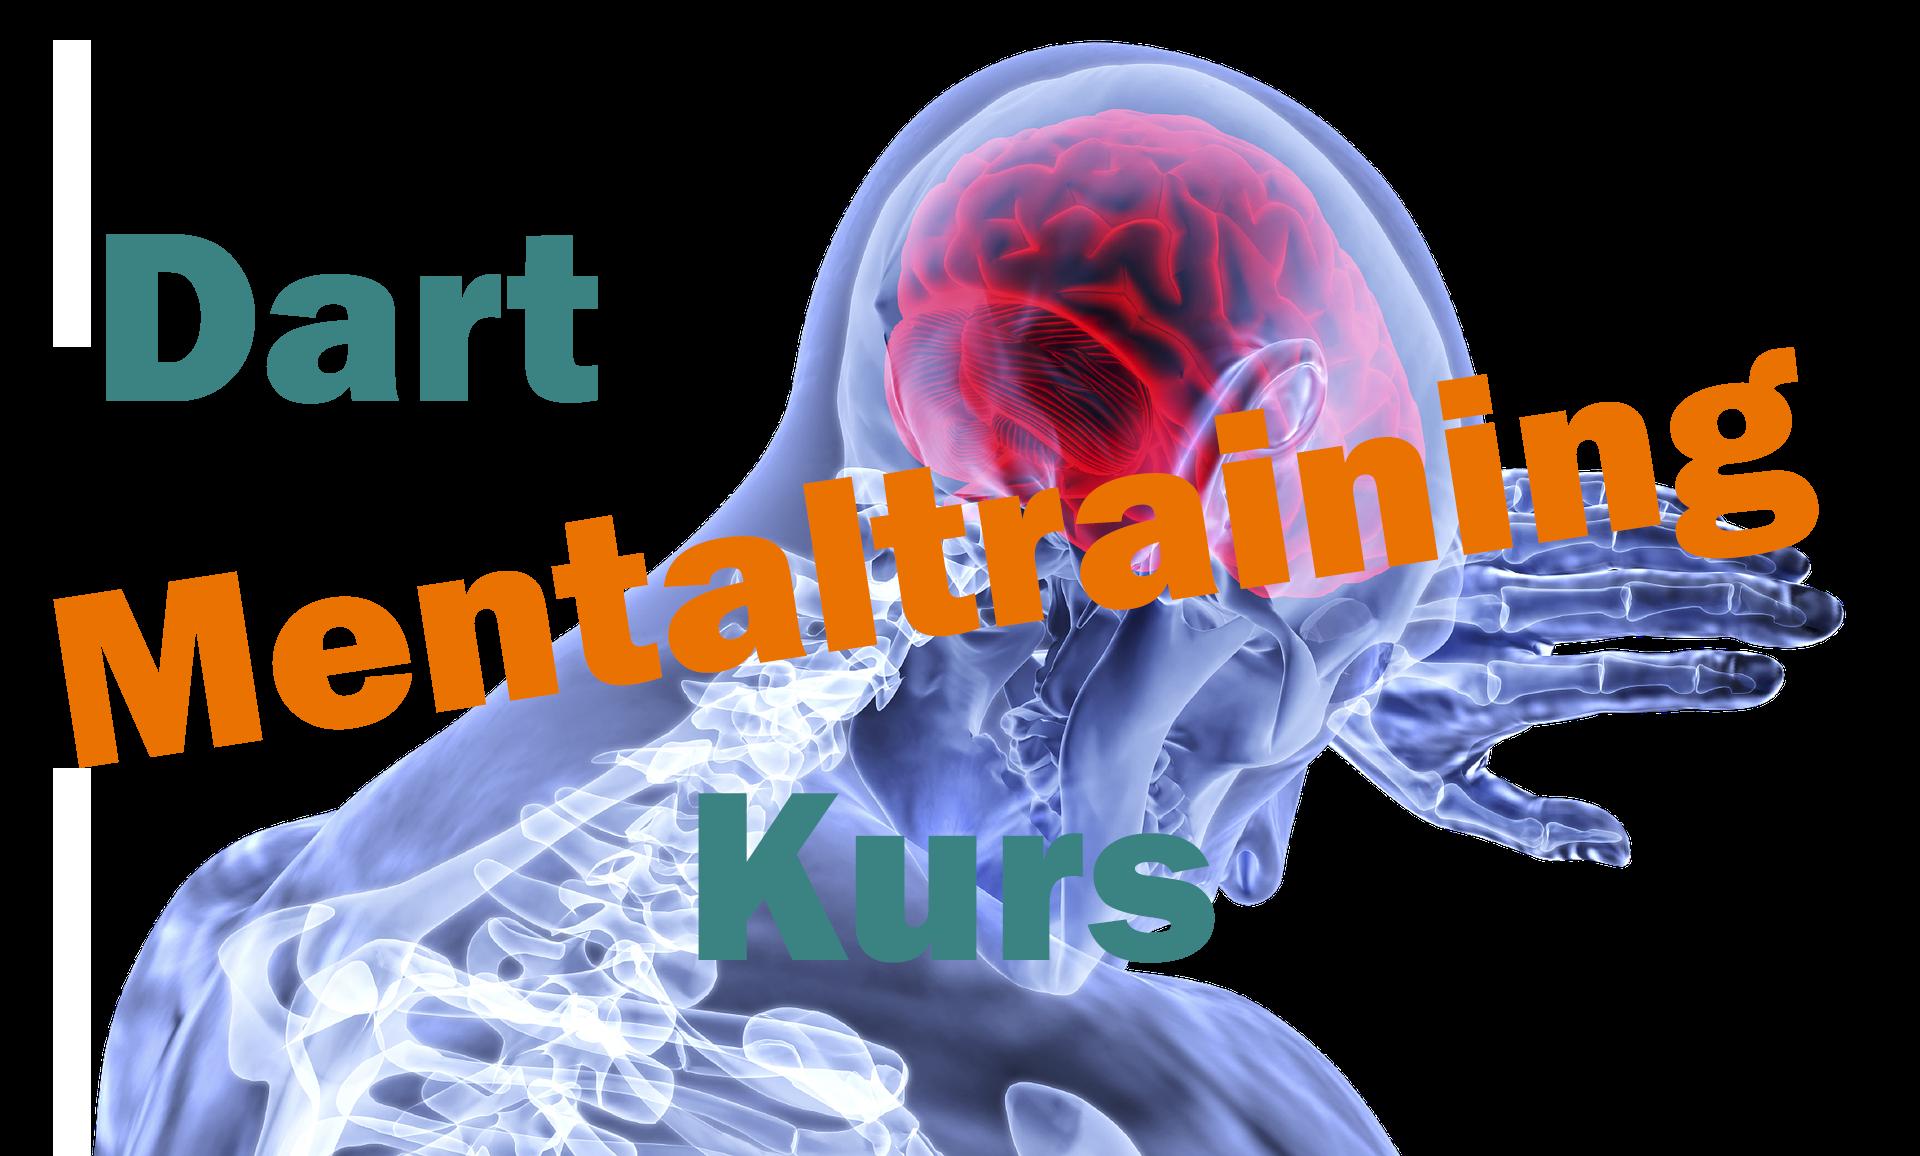 Mentaltraining Dartblog